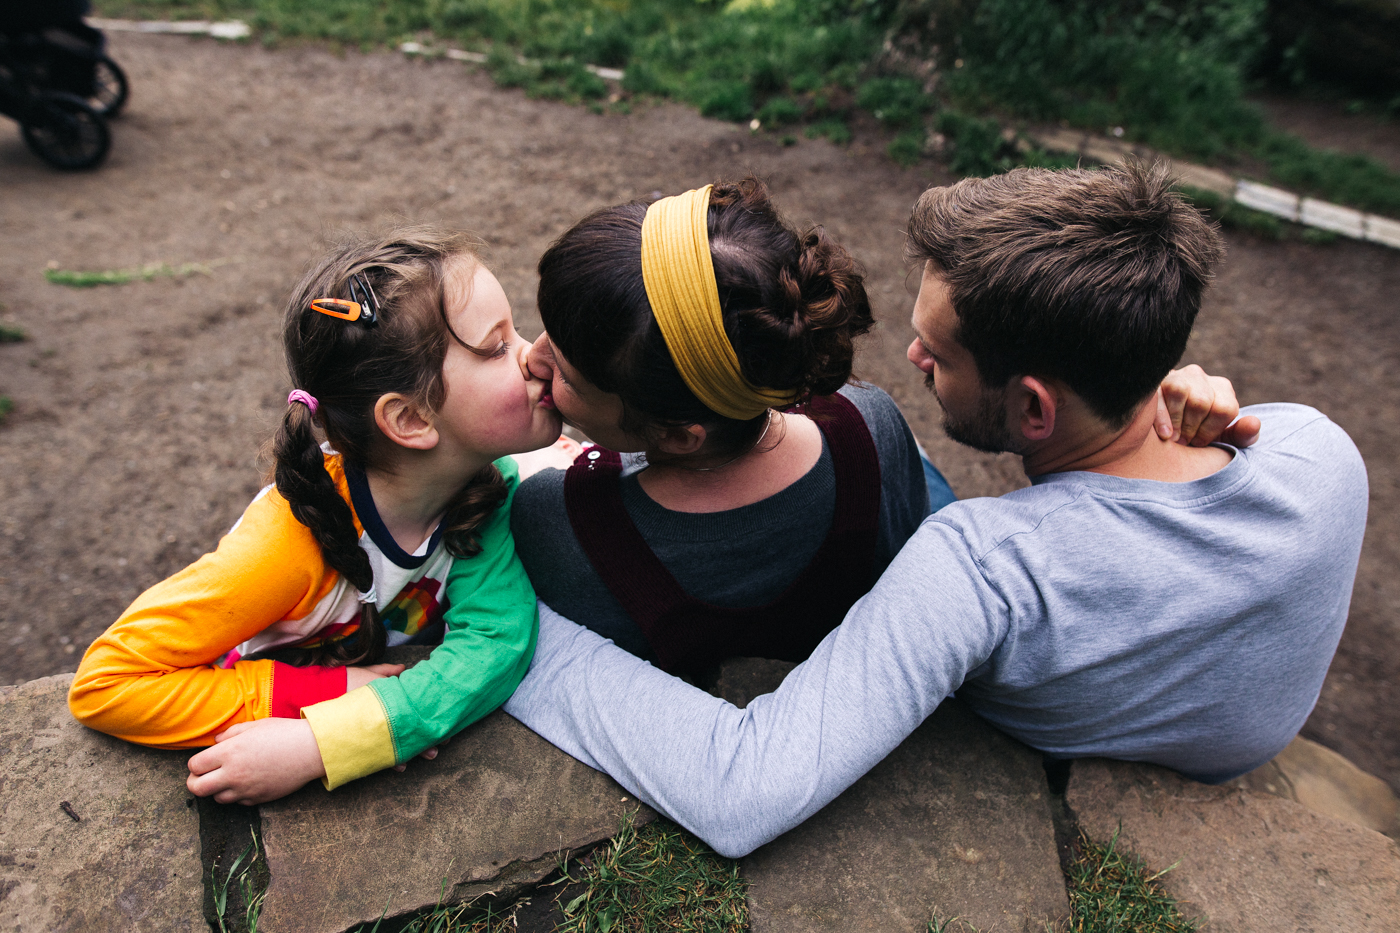 preston-park-stockton-family-shoot-teesside-middlesbrough-stockton-natural-photography-0011.jpg